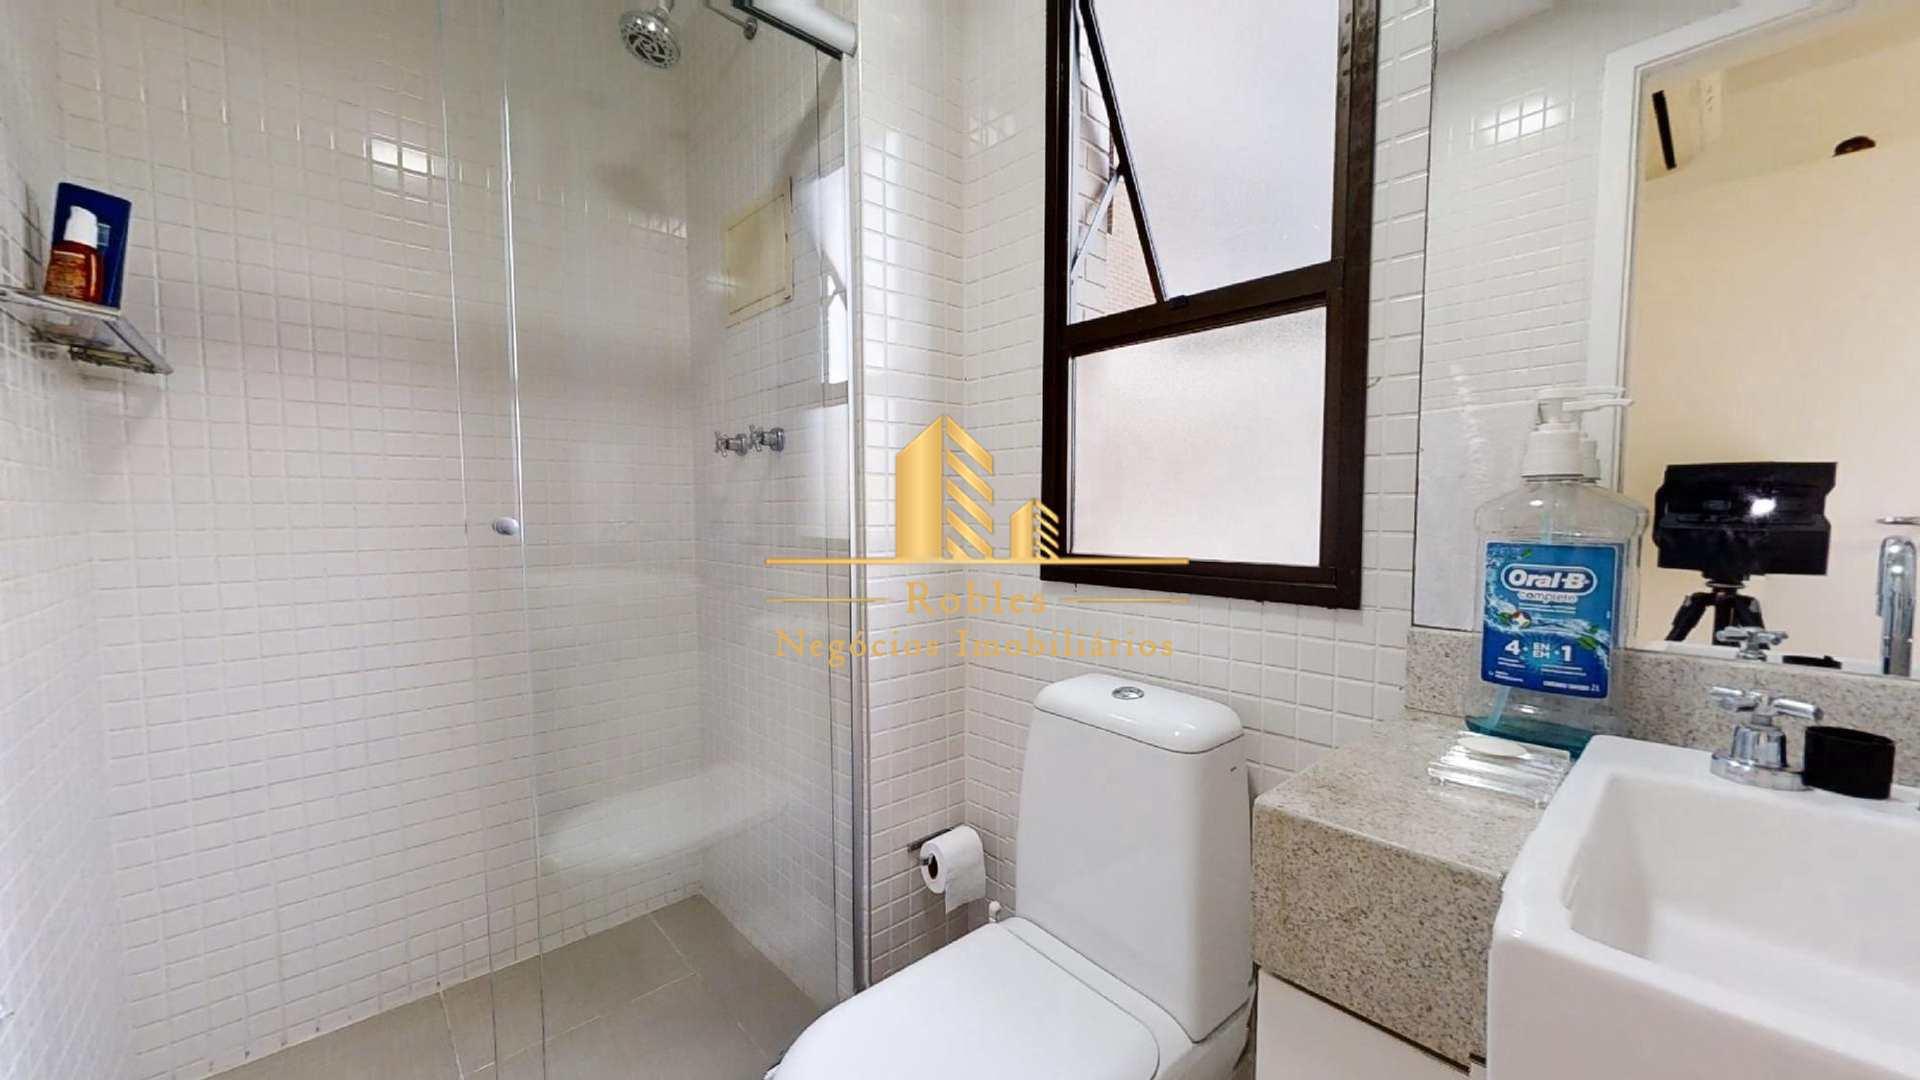 Apartamento com 4 dorms, Granja Julieta, São Paulo - R$ 2.3 mi, Cod: 1684